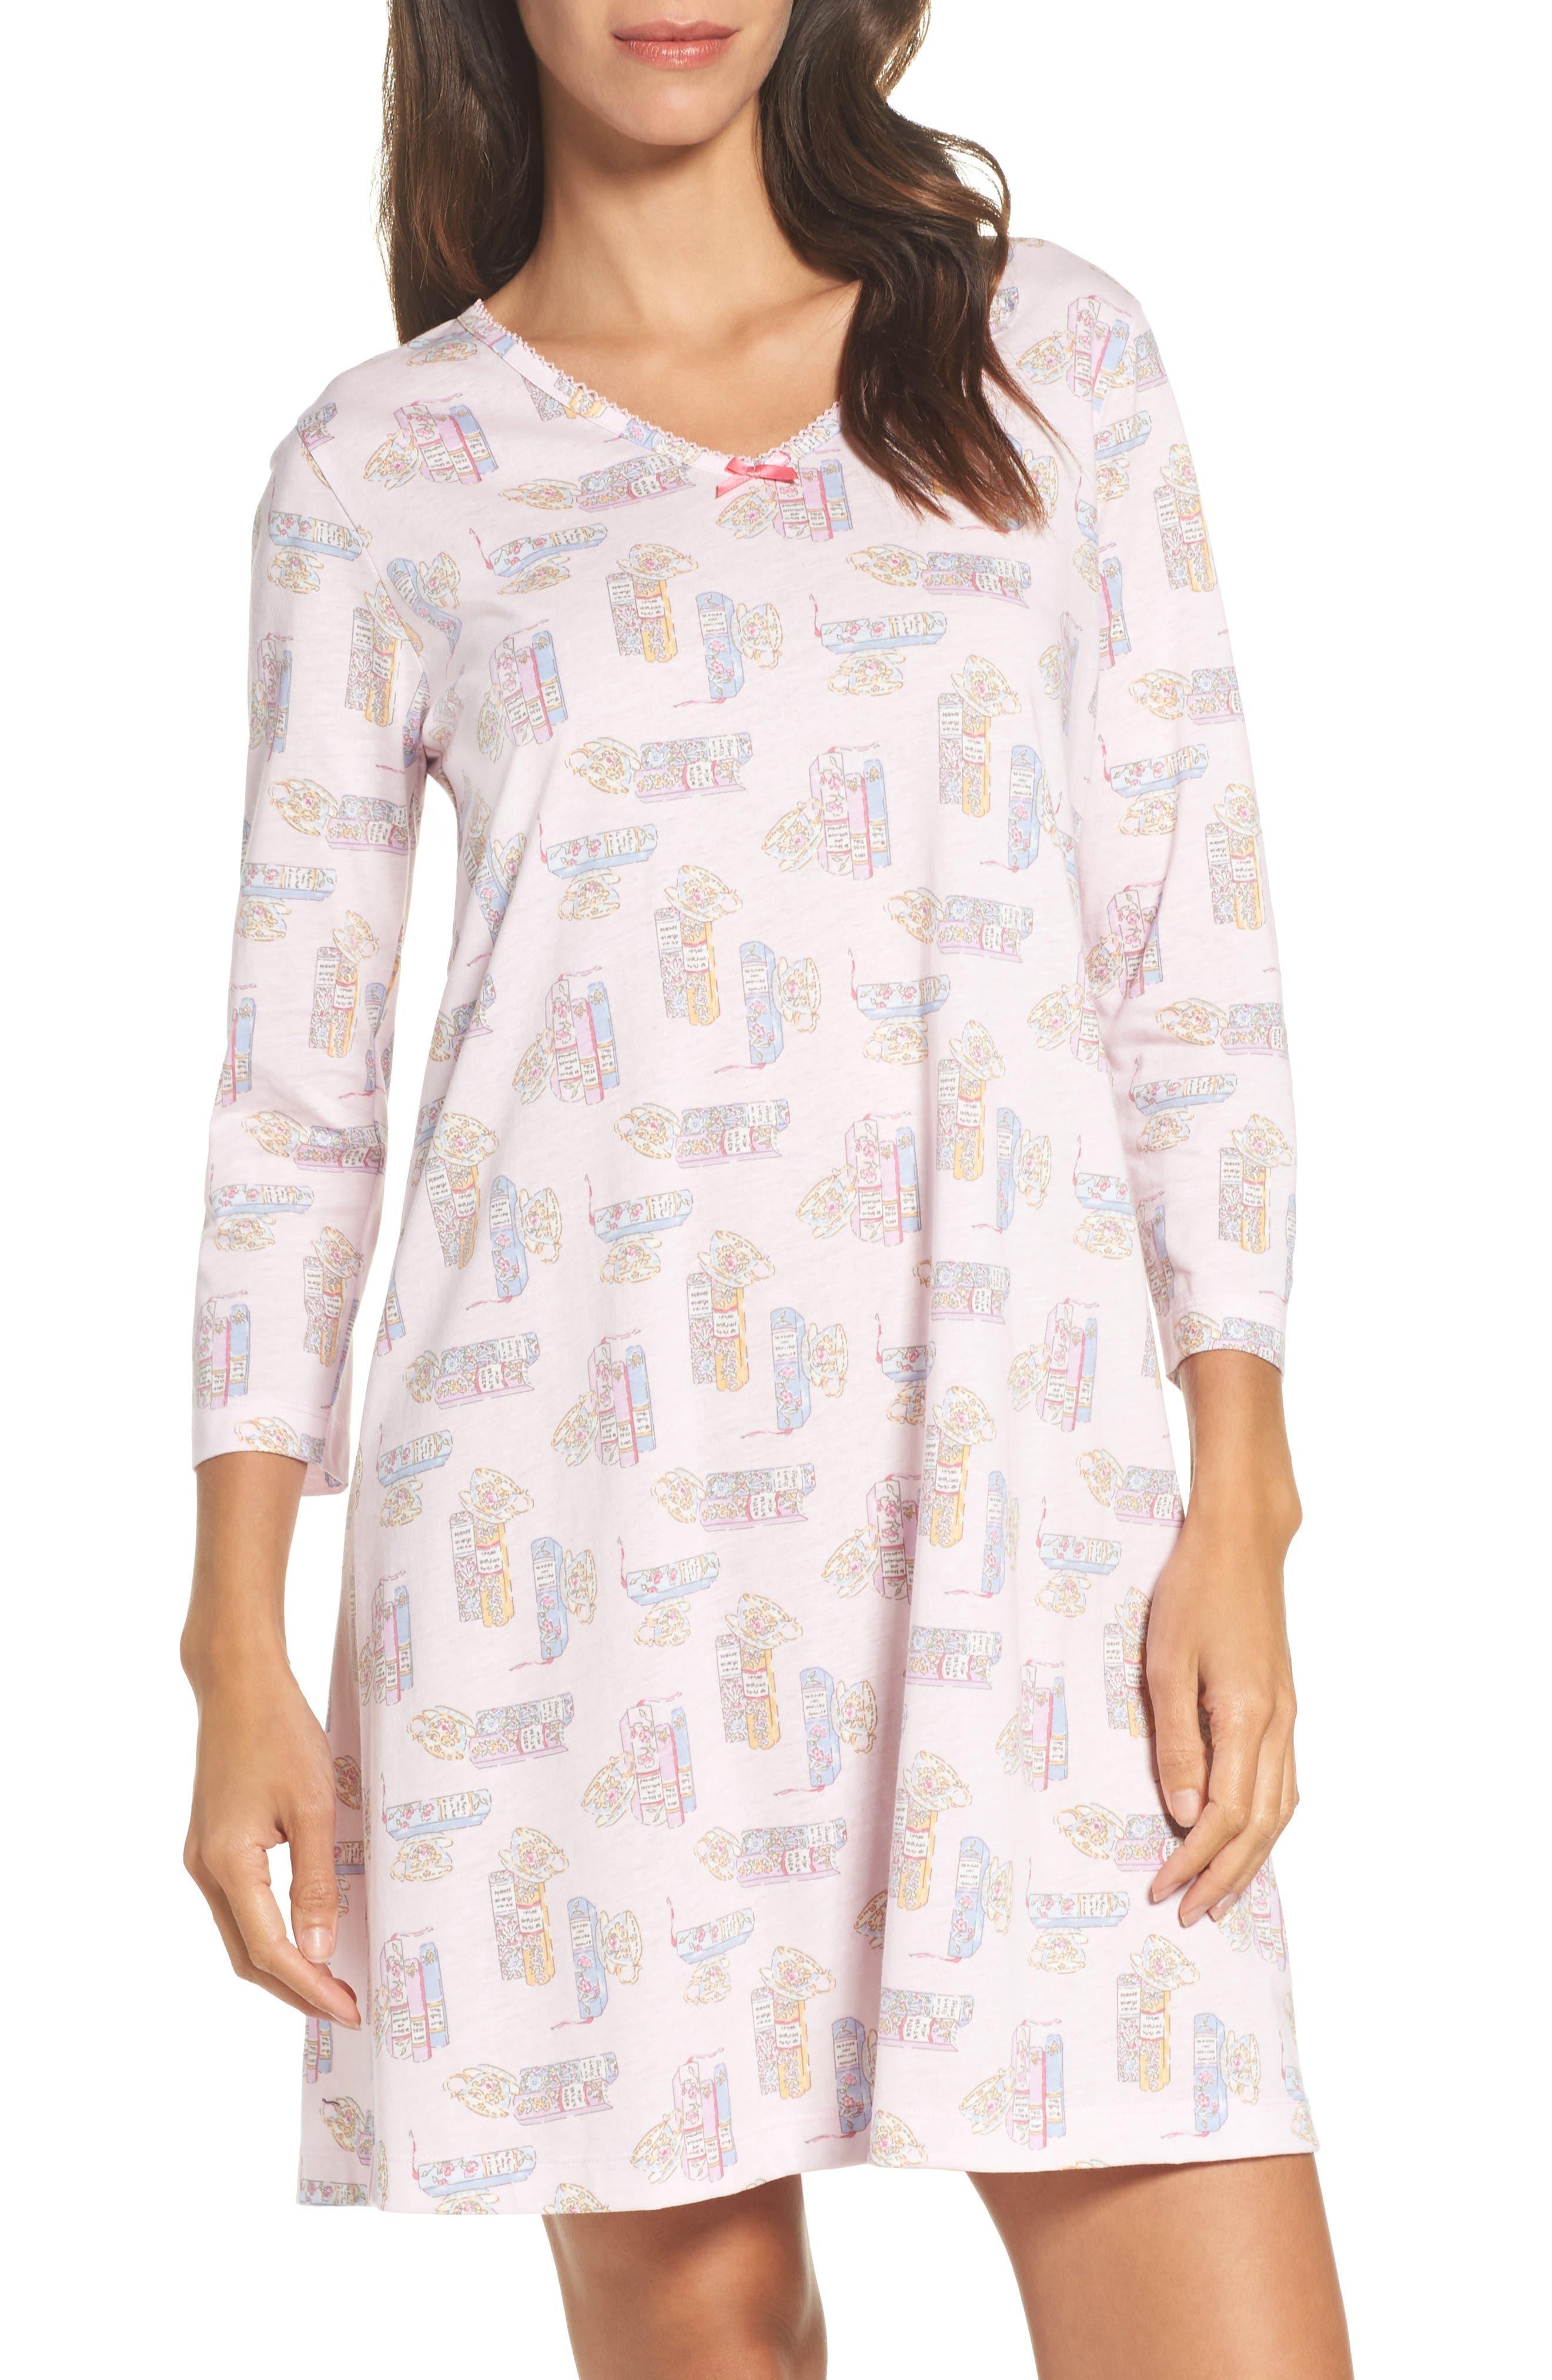 Alternate Image 1 Selected - Carole Hochman Sleep Shirt